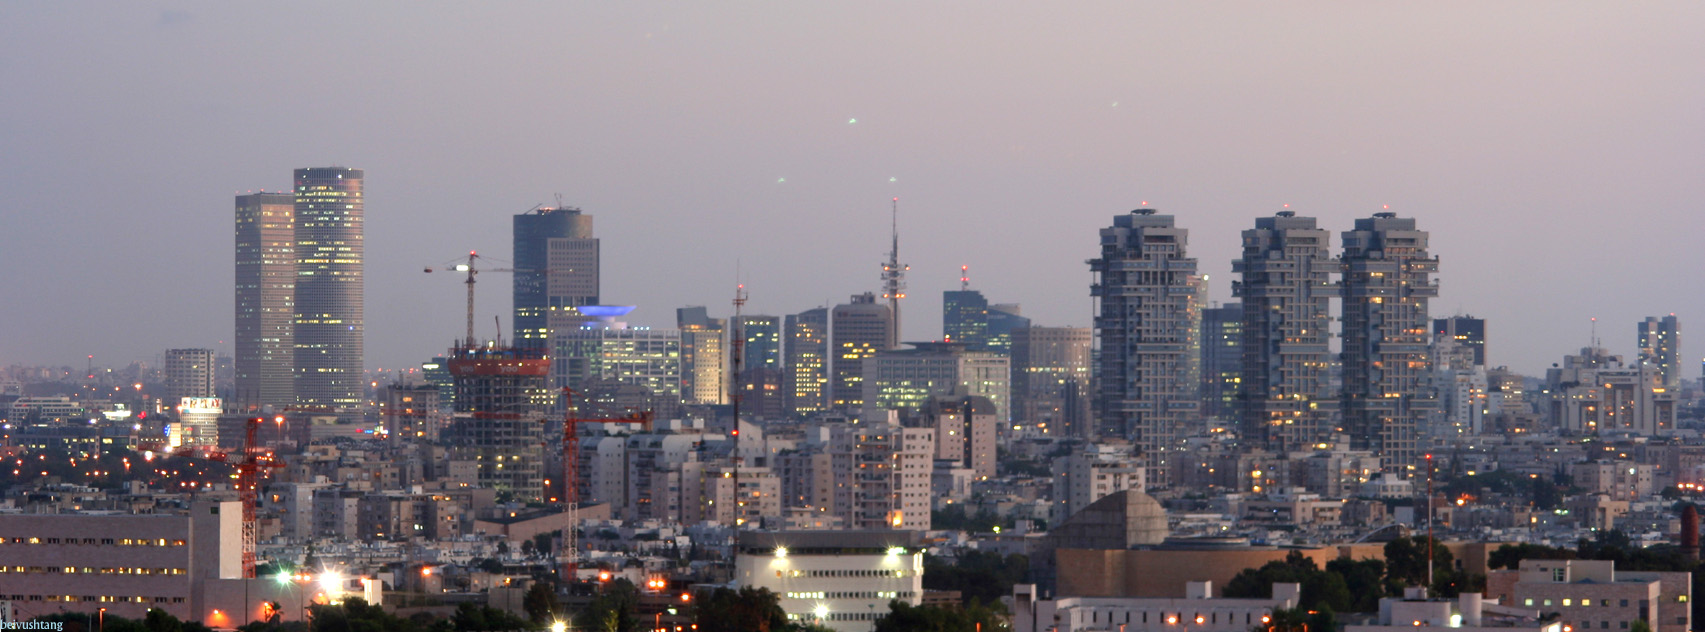 Panorama Tel Avivu (fot. Beivushtang / wikimedia.org / CC BY-SA 3.0)